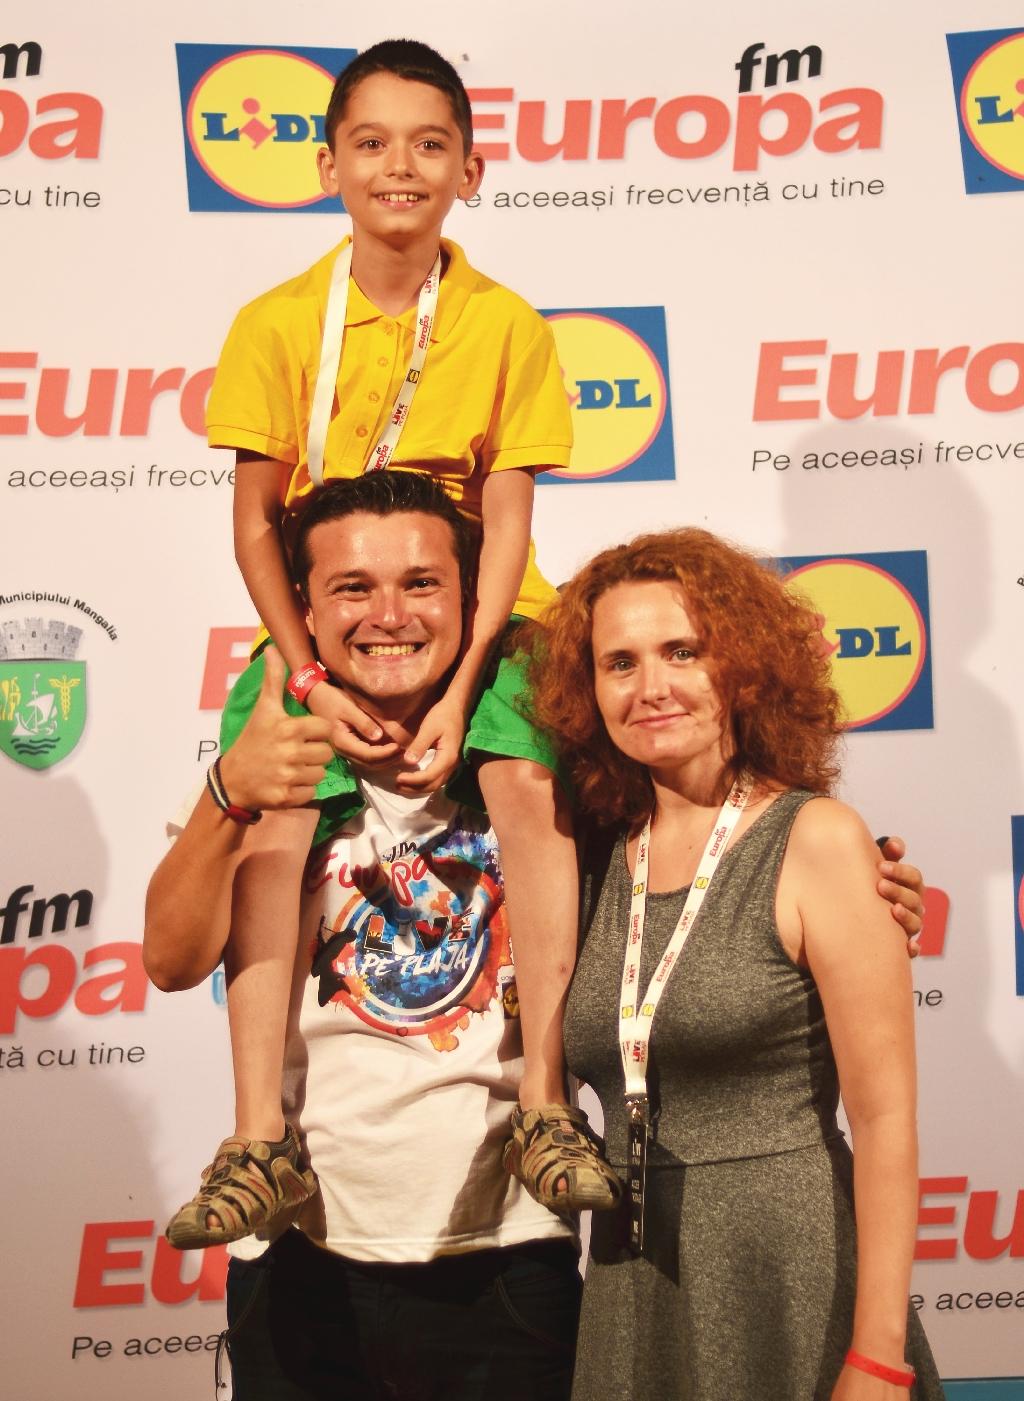 Roxana Dumitrascuta alaturi de Toader Paun in culisele Europa FM Live pe Plaja 2015